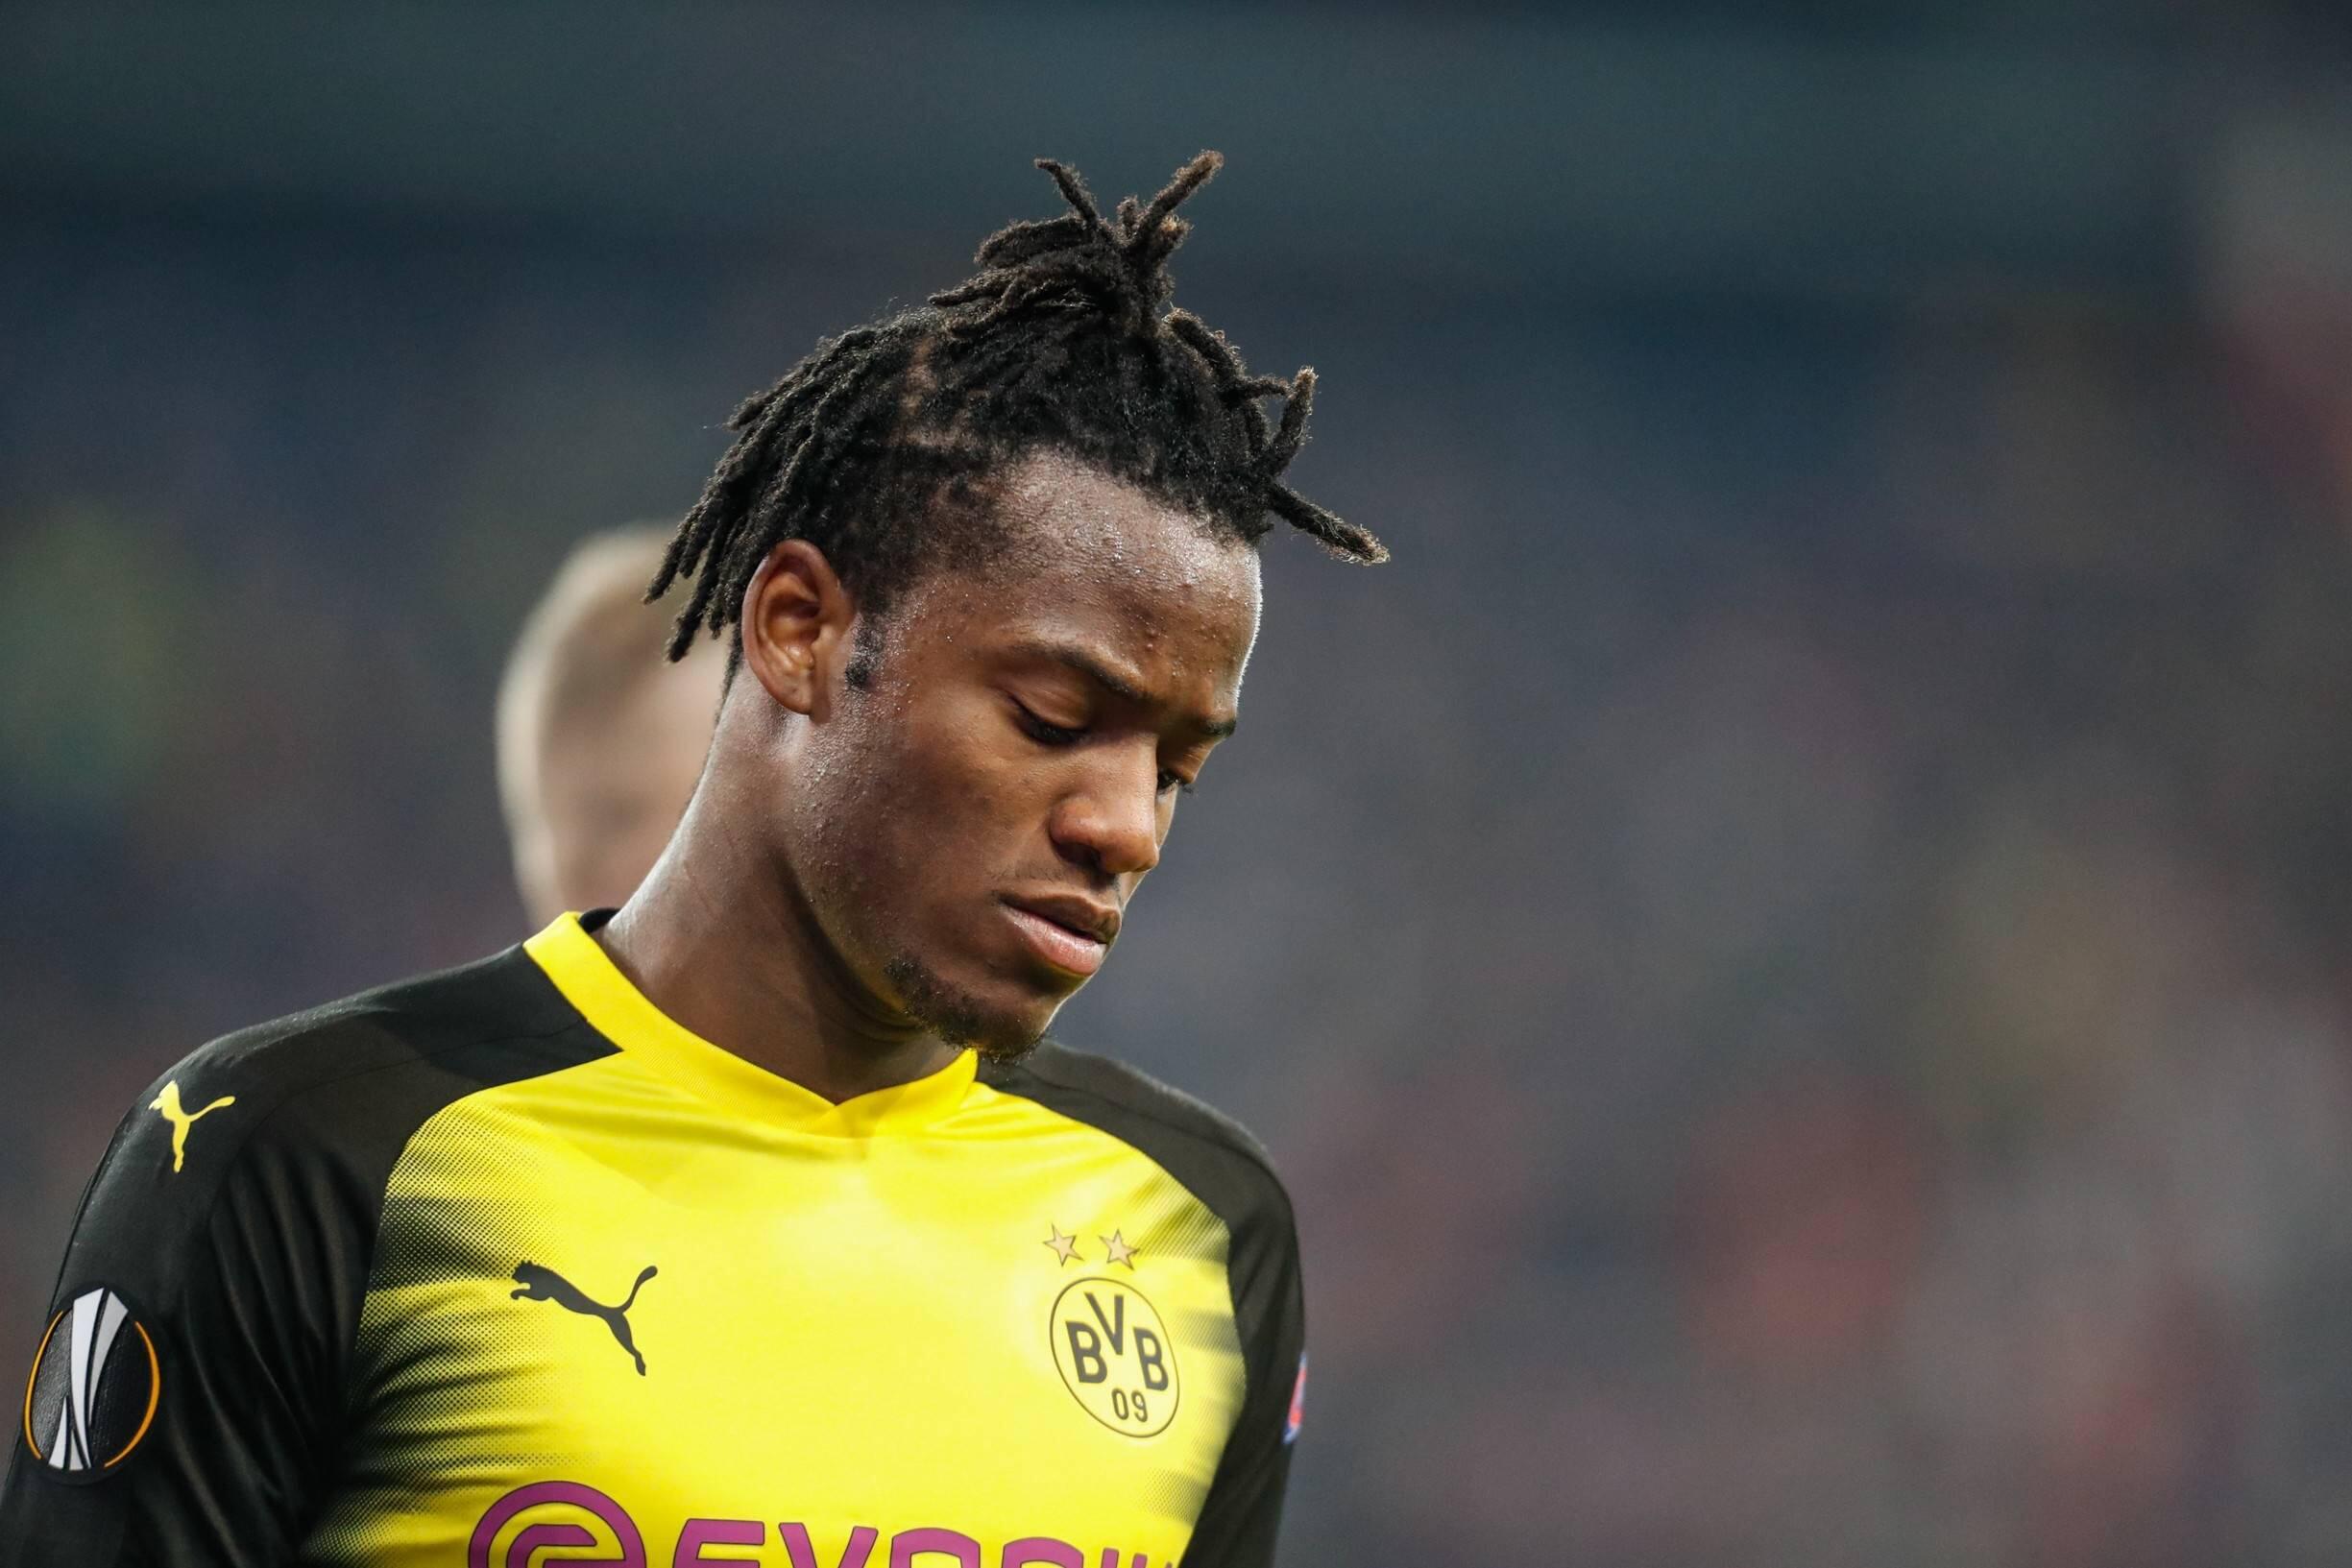 Bild zu Borussia Dortmund, BVB, Michy Batshuayi, Lautaro Martinez